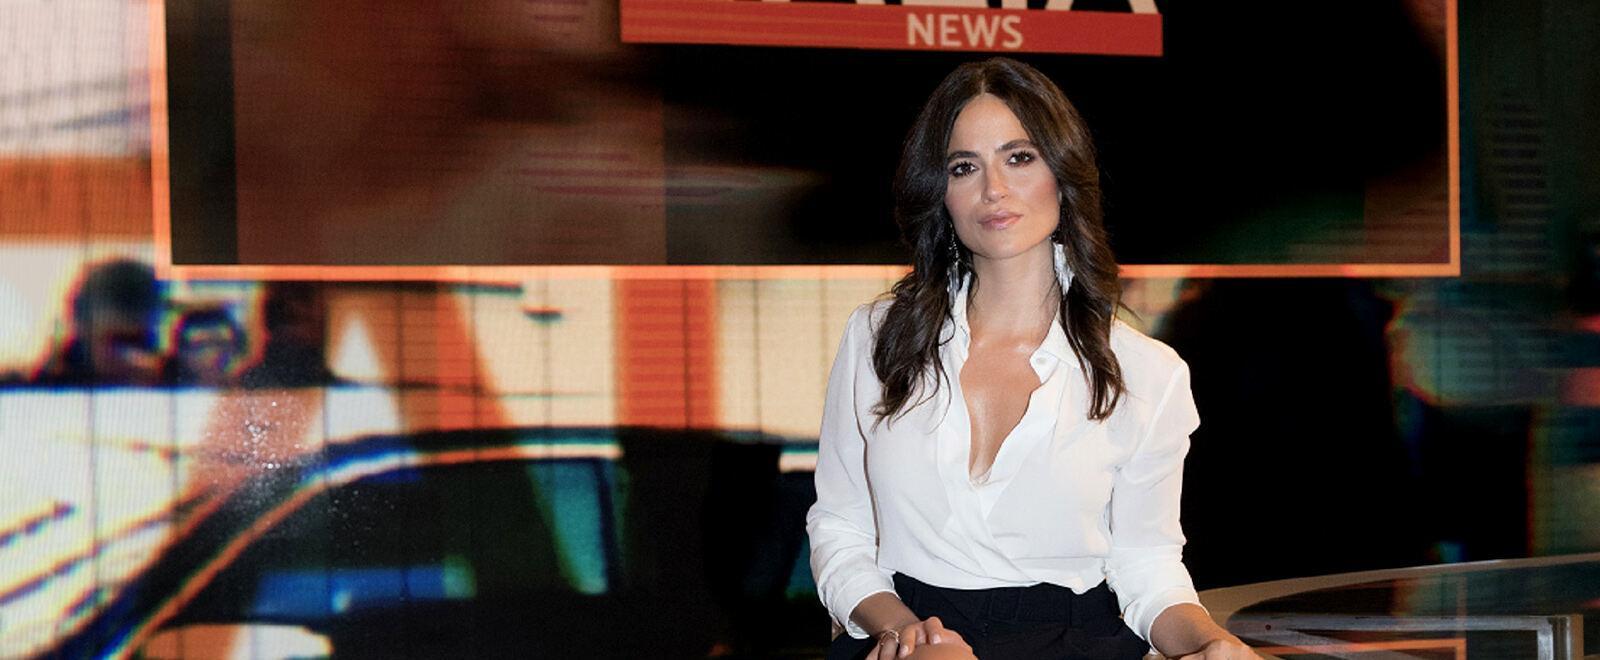 Stasera italia news